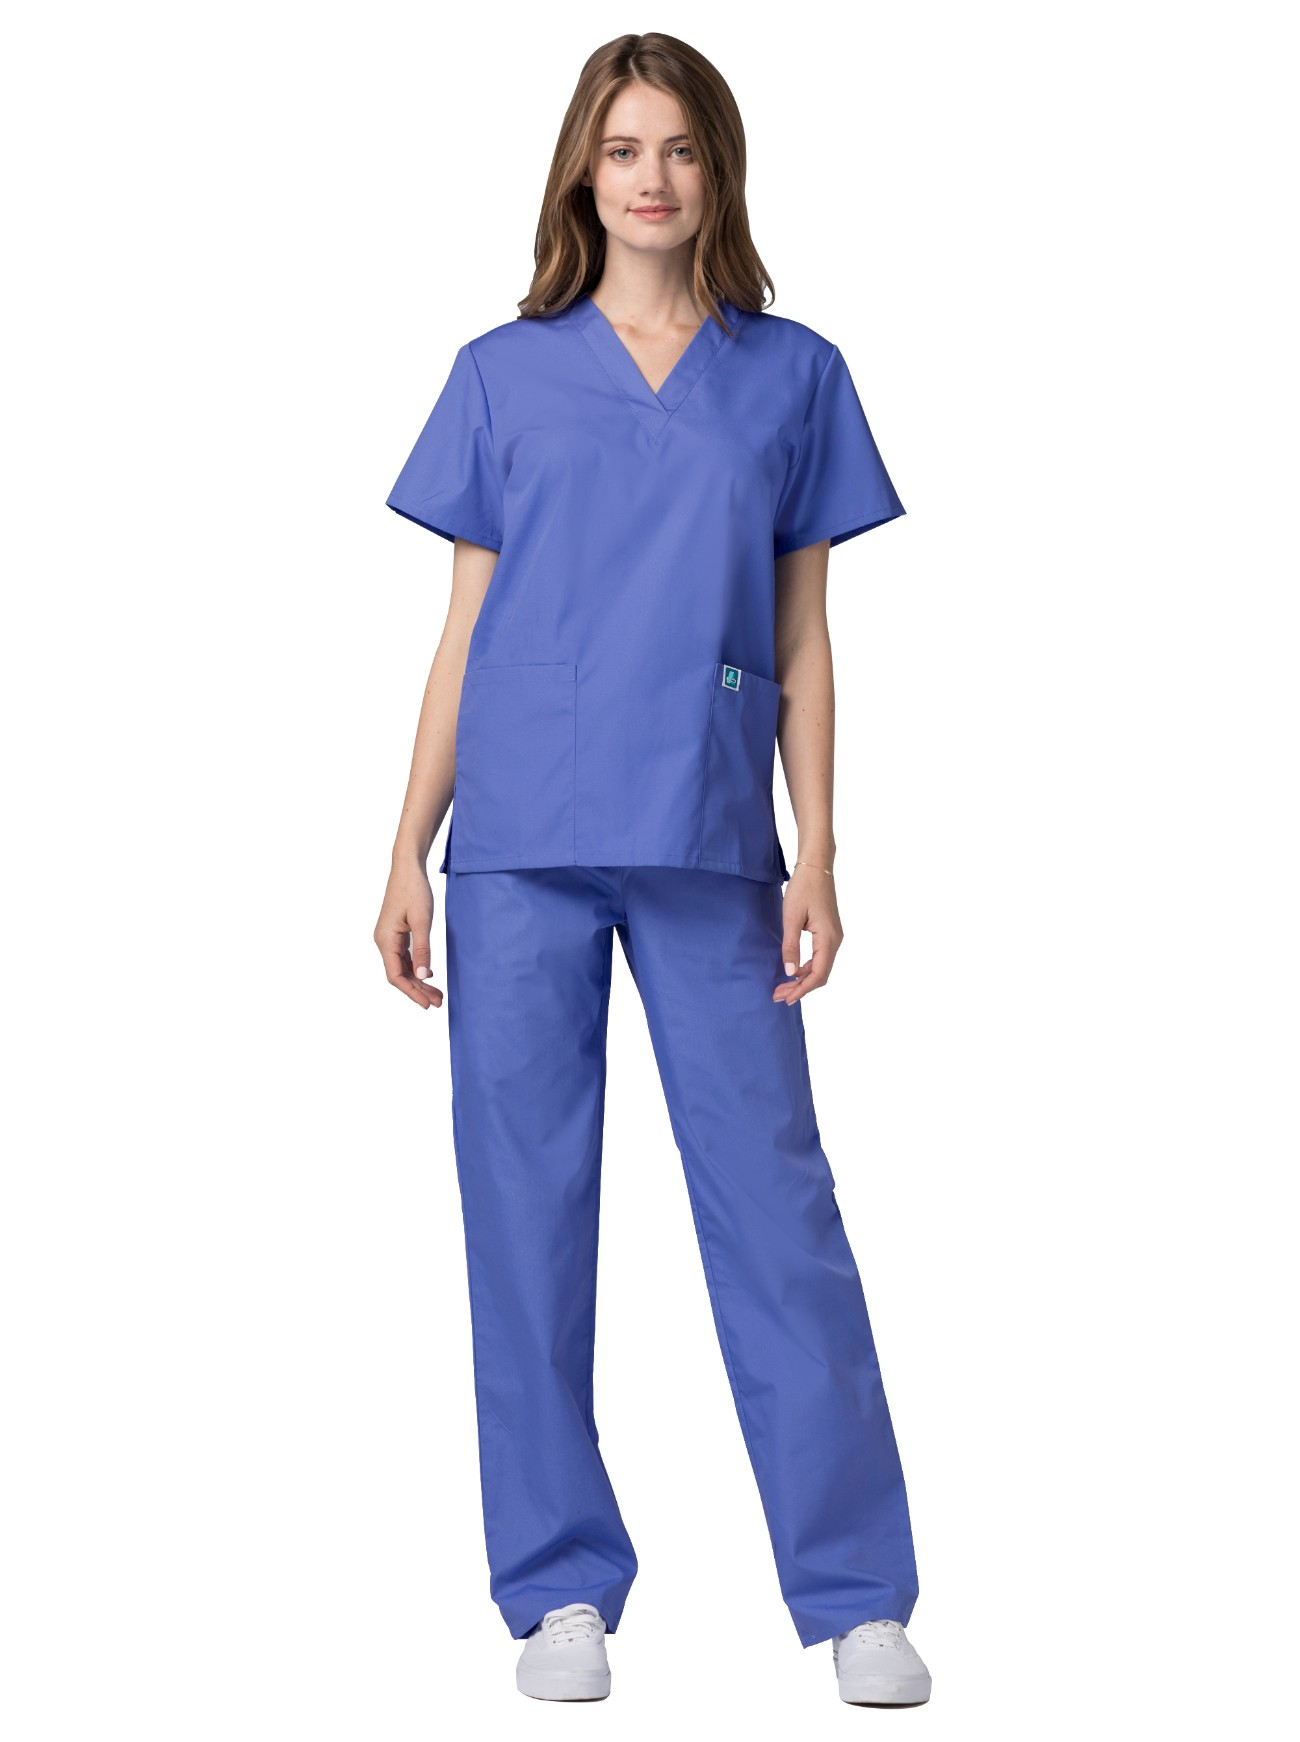 701 Adar Universal Unisex Drawstring Scrub Set-Adar Medical Uniforms